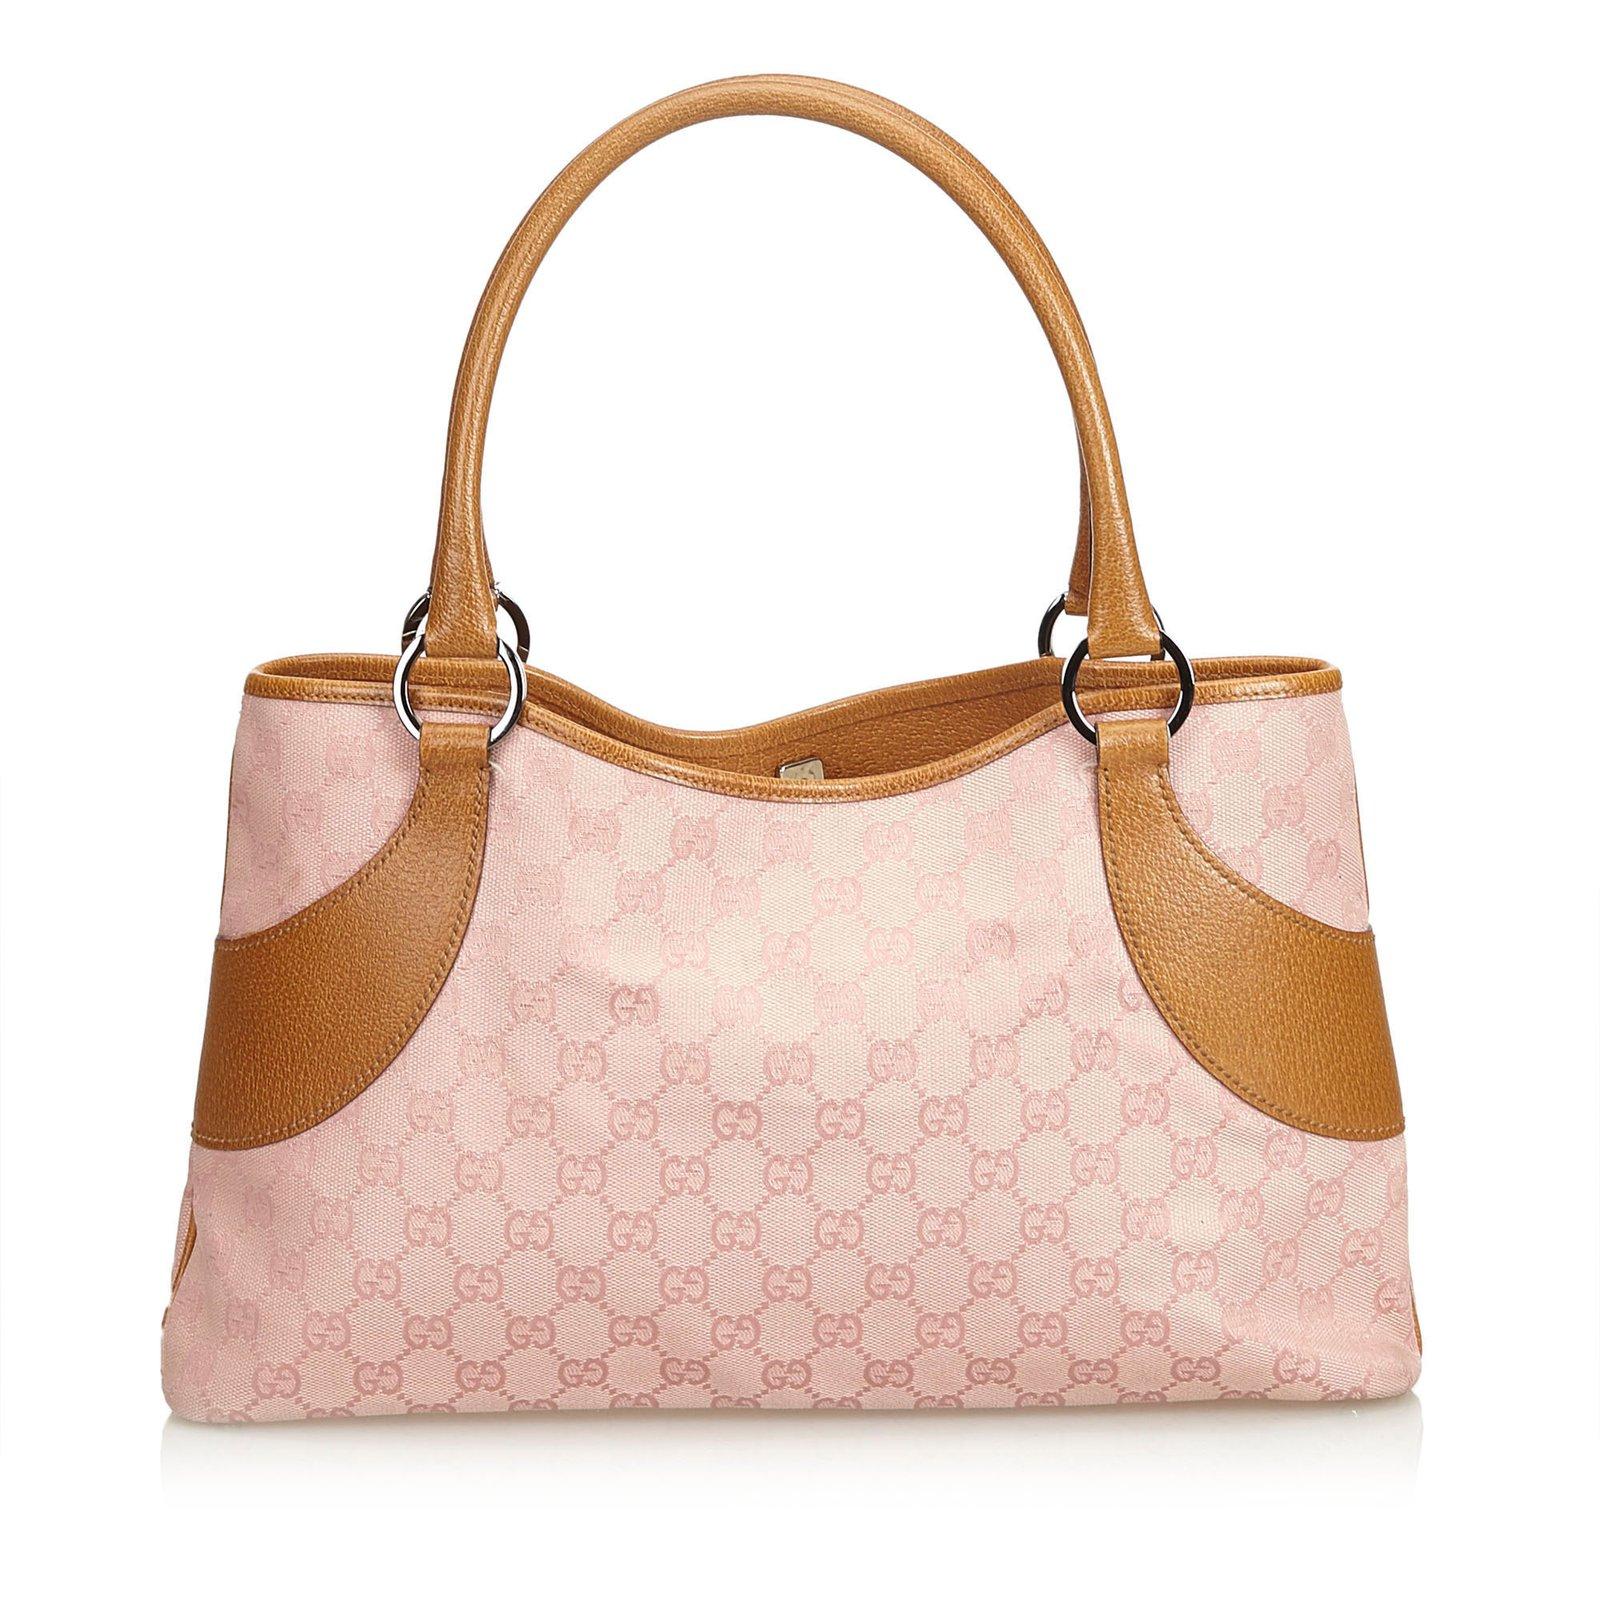 348bedd40 Gucci GG Jacquard Handbag Handbags Leather,Other,Cloth Brown,Pink ref.104594